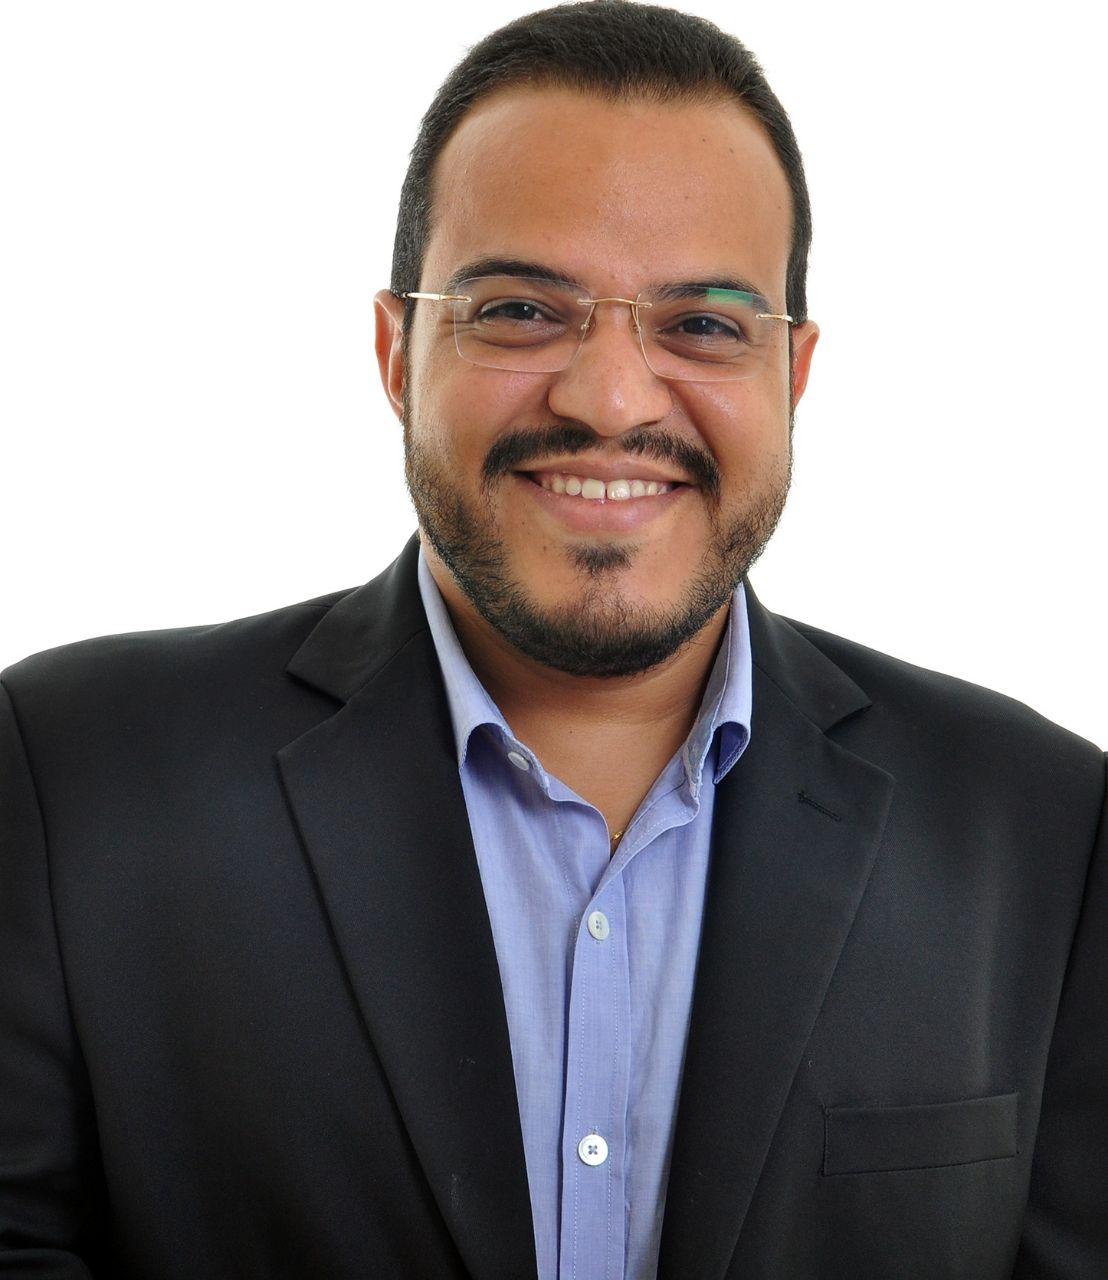 Pau dos Ferros – Clistenes Carlos